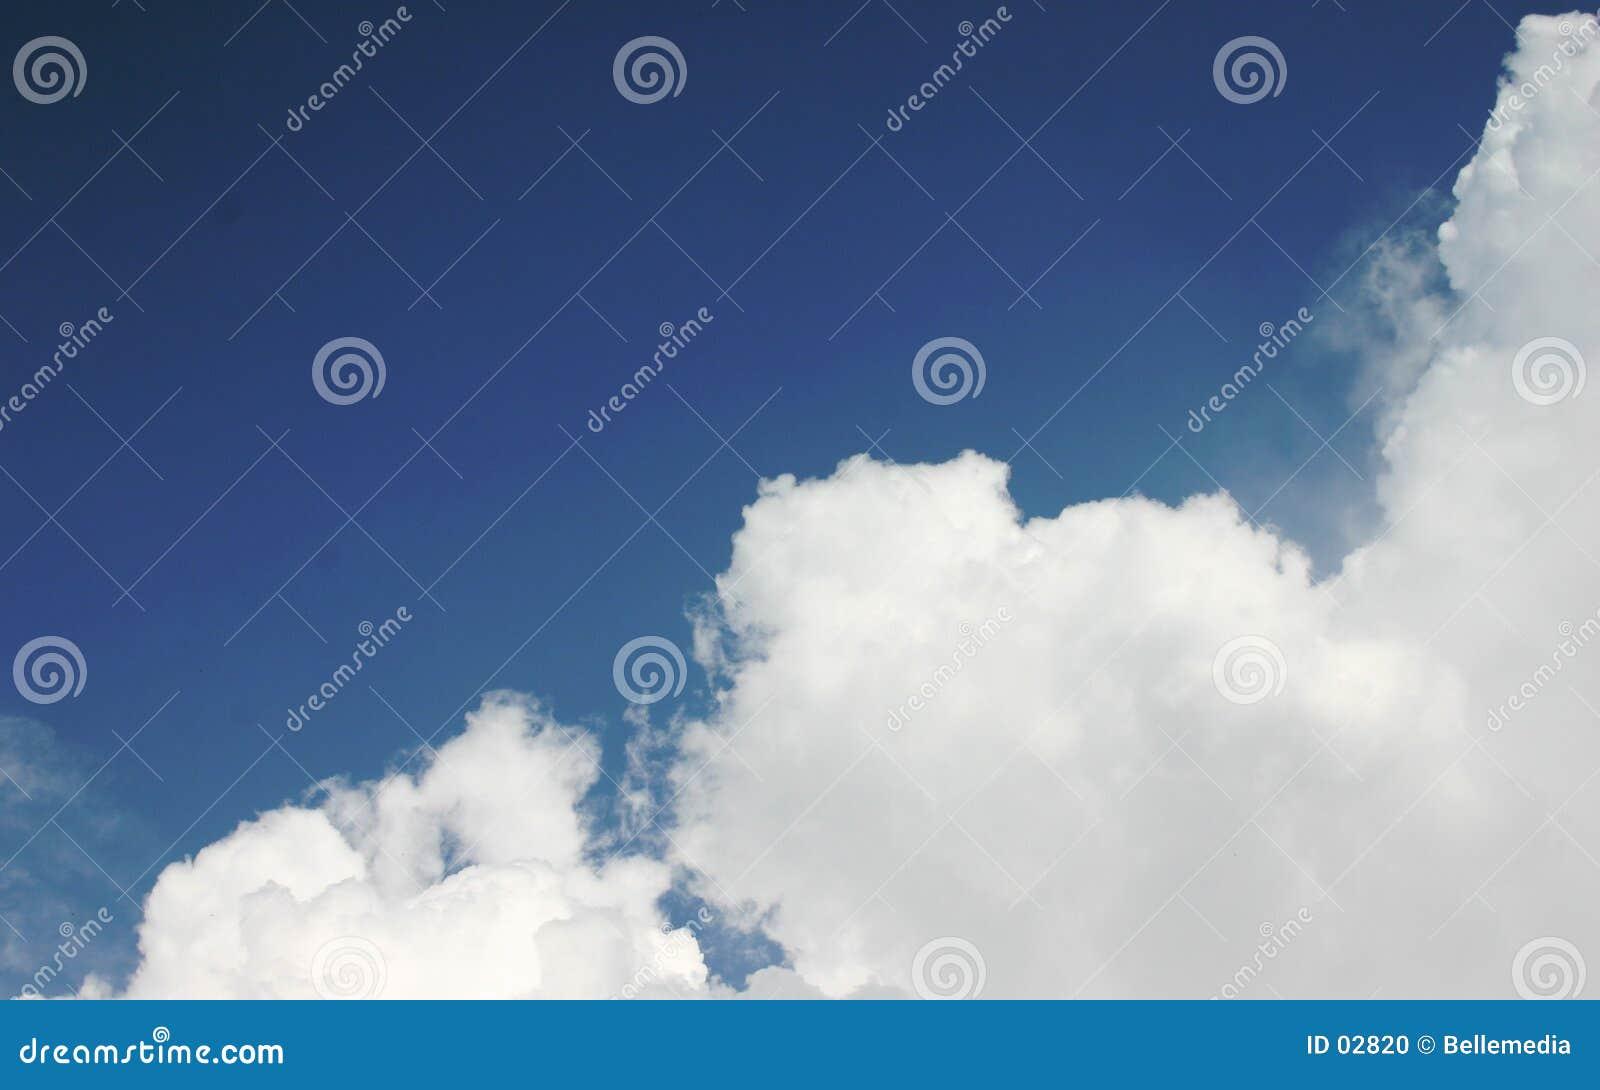 Sonhos - nuvens